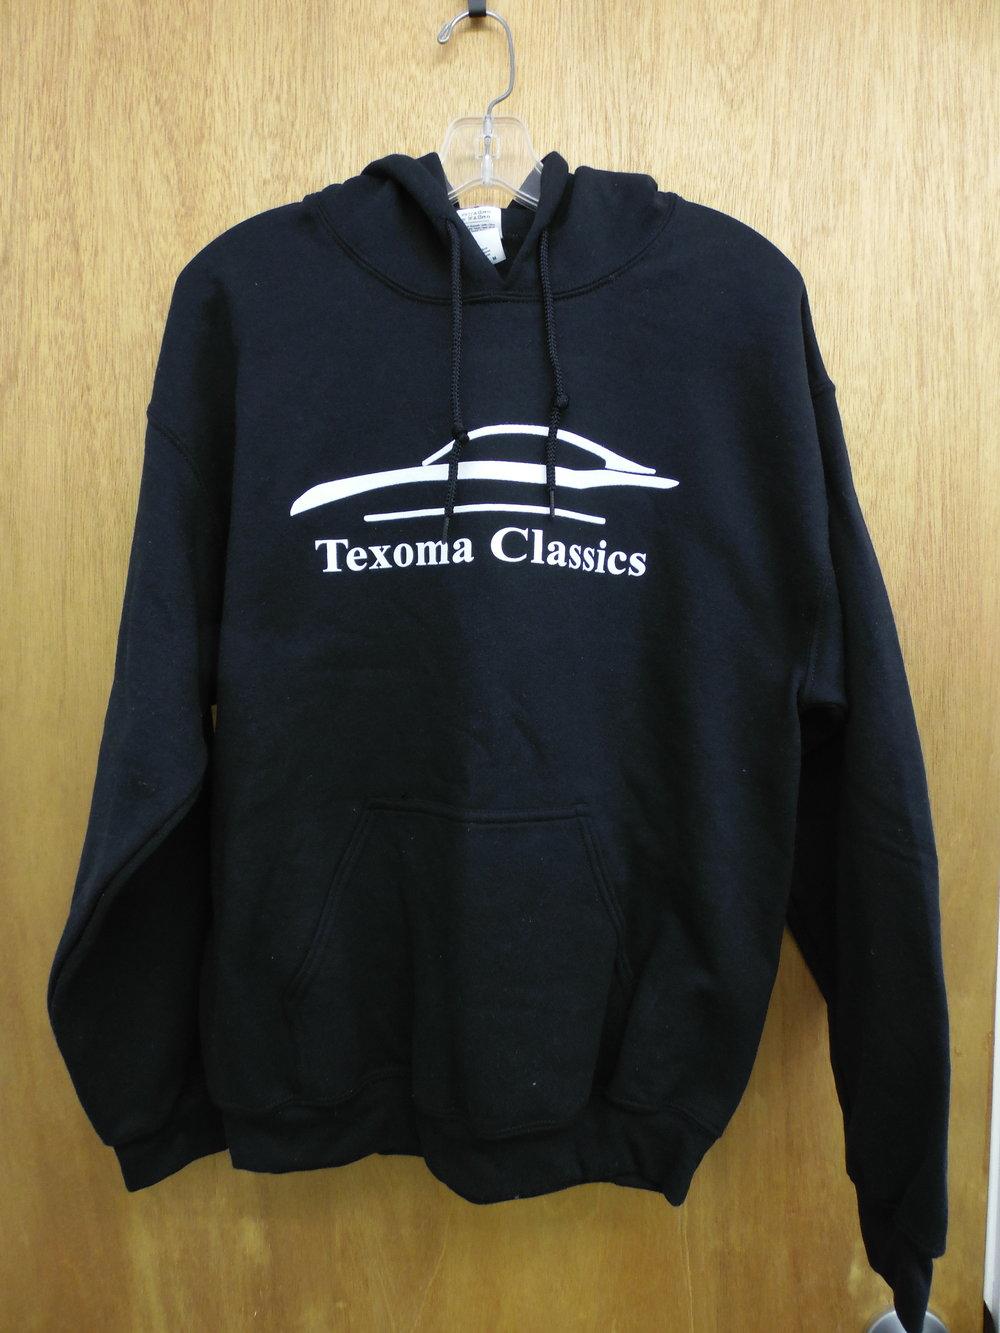 Texoma Classics Hoodies